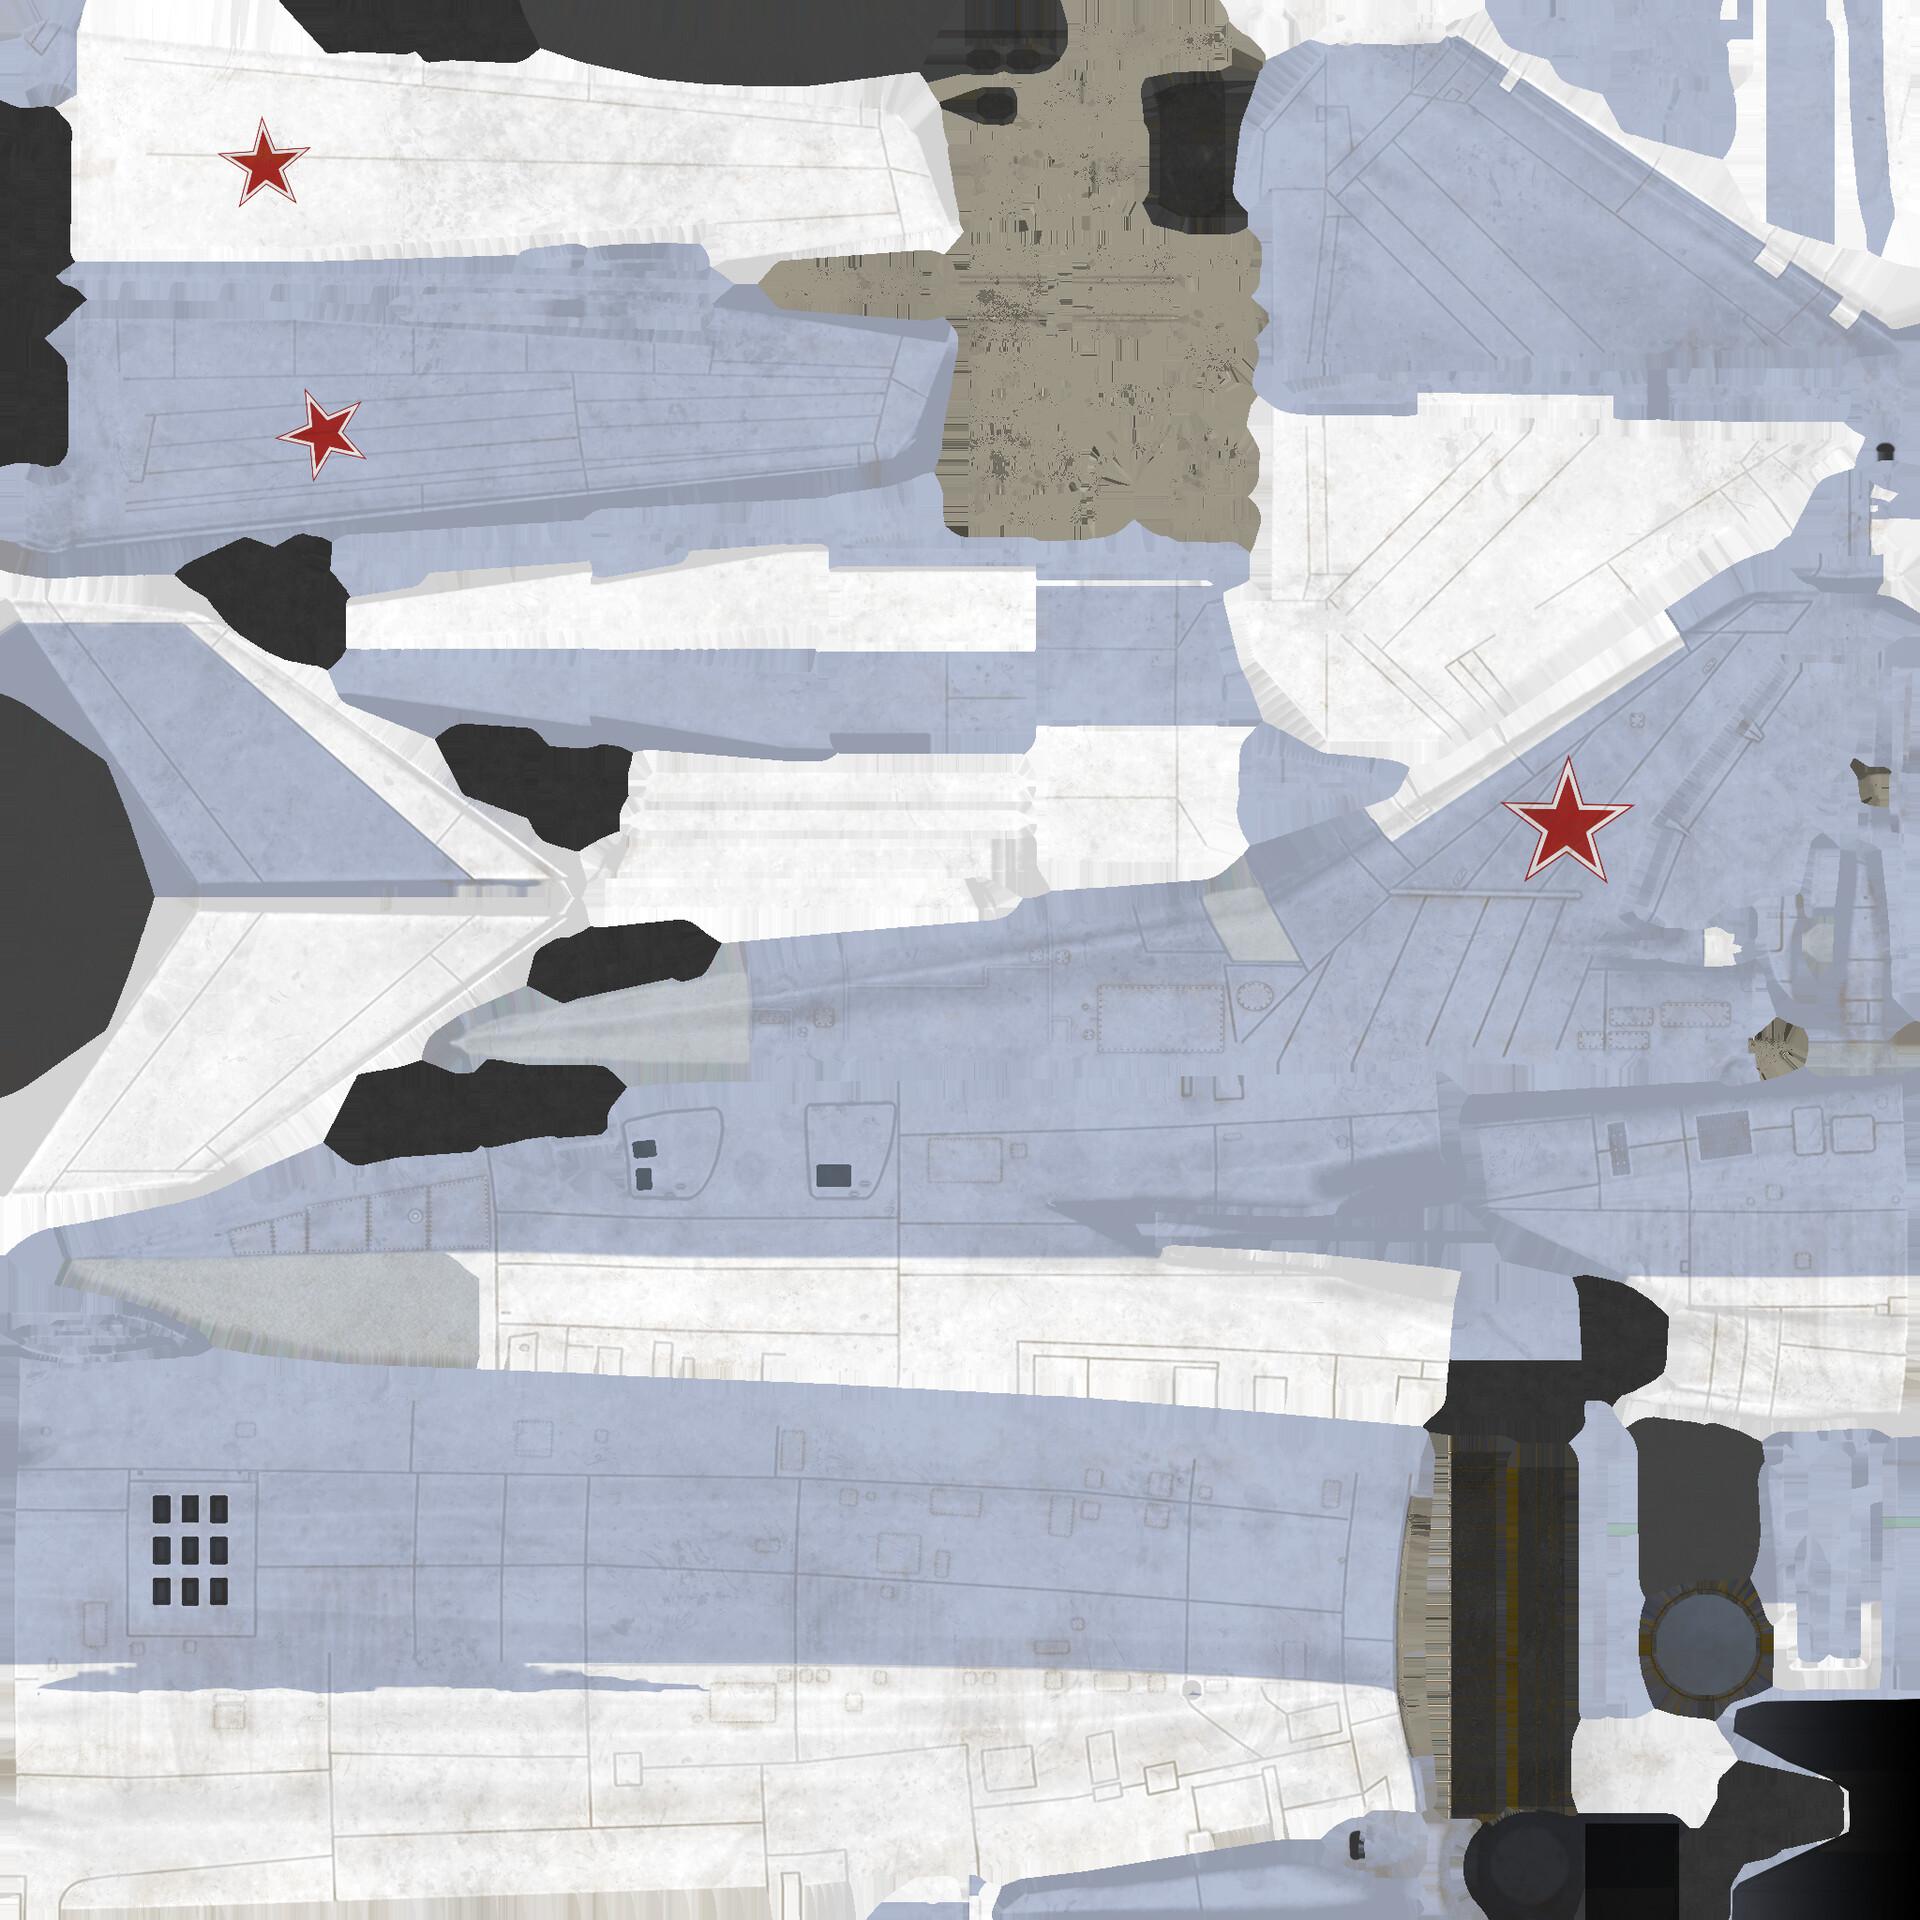 Justin wildhorn tu 22m3 texturealbedotransparency v001 jw